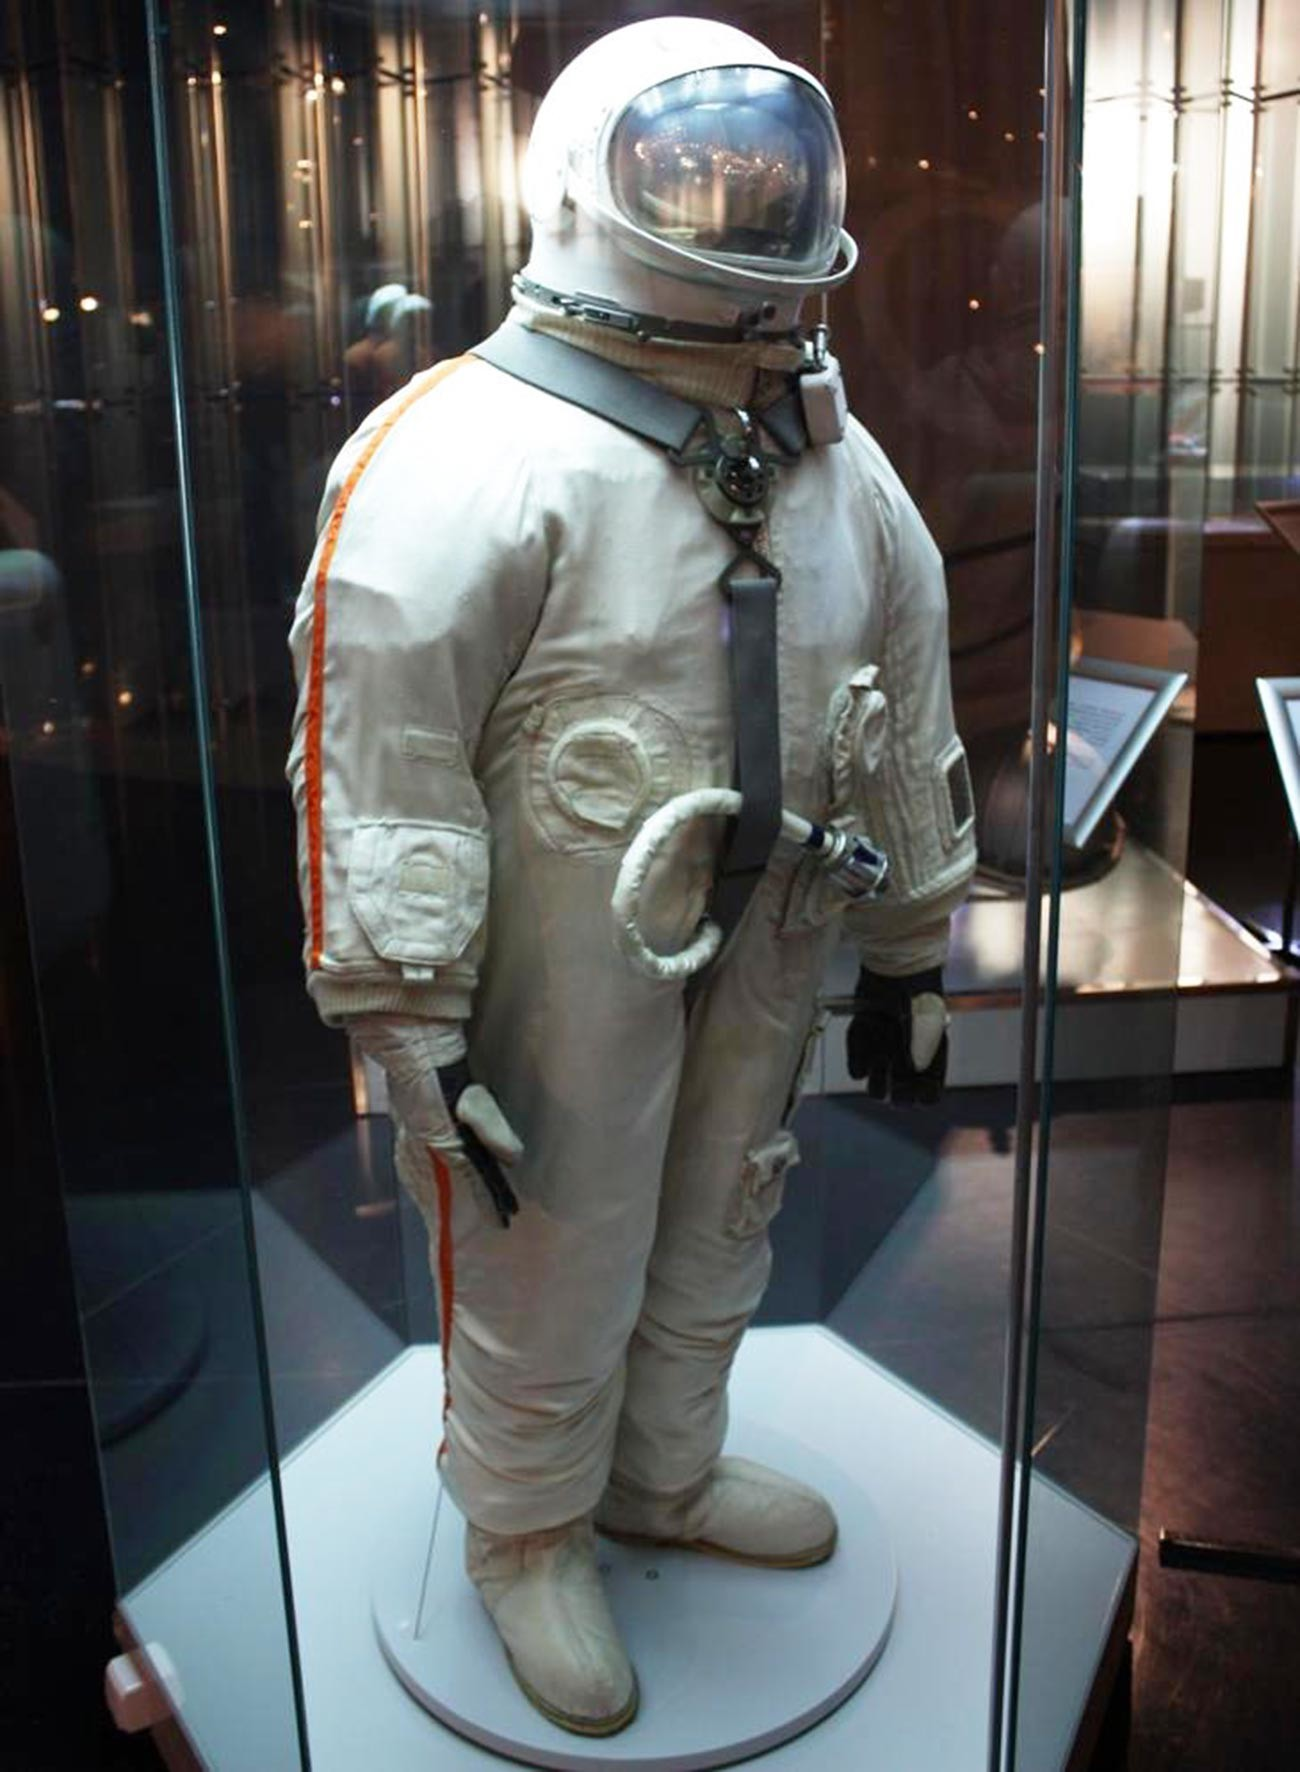 Berkut spacesuit